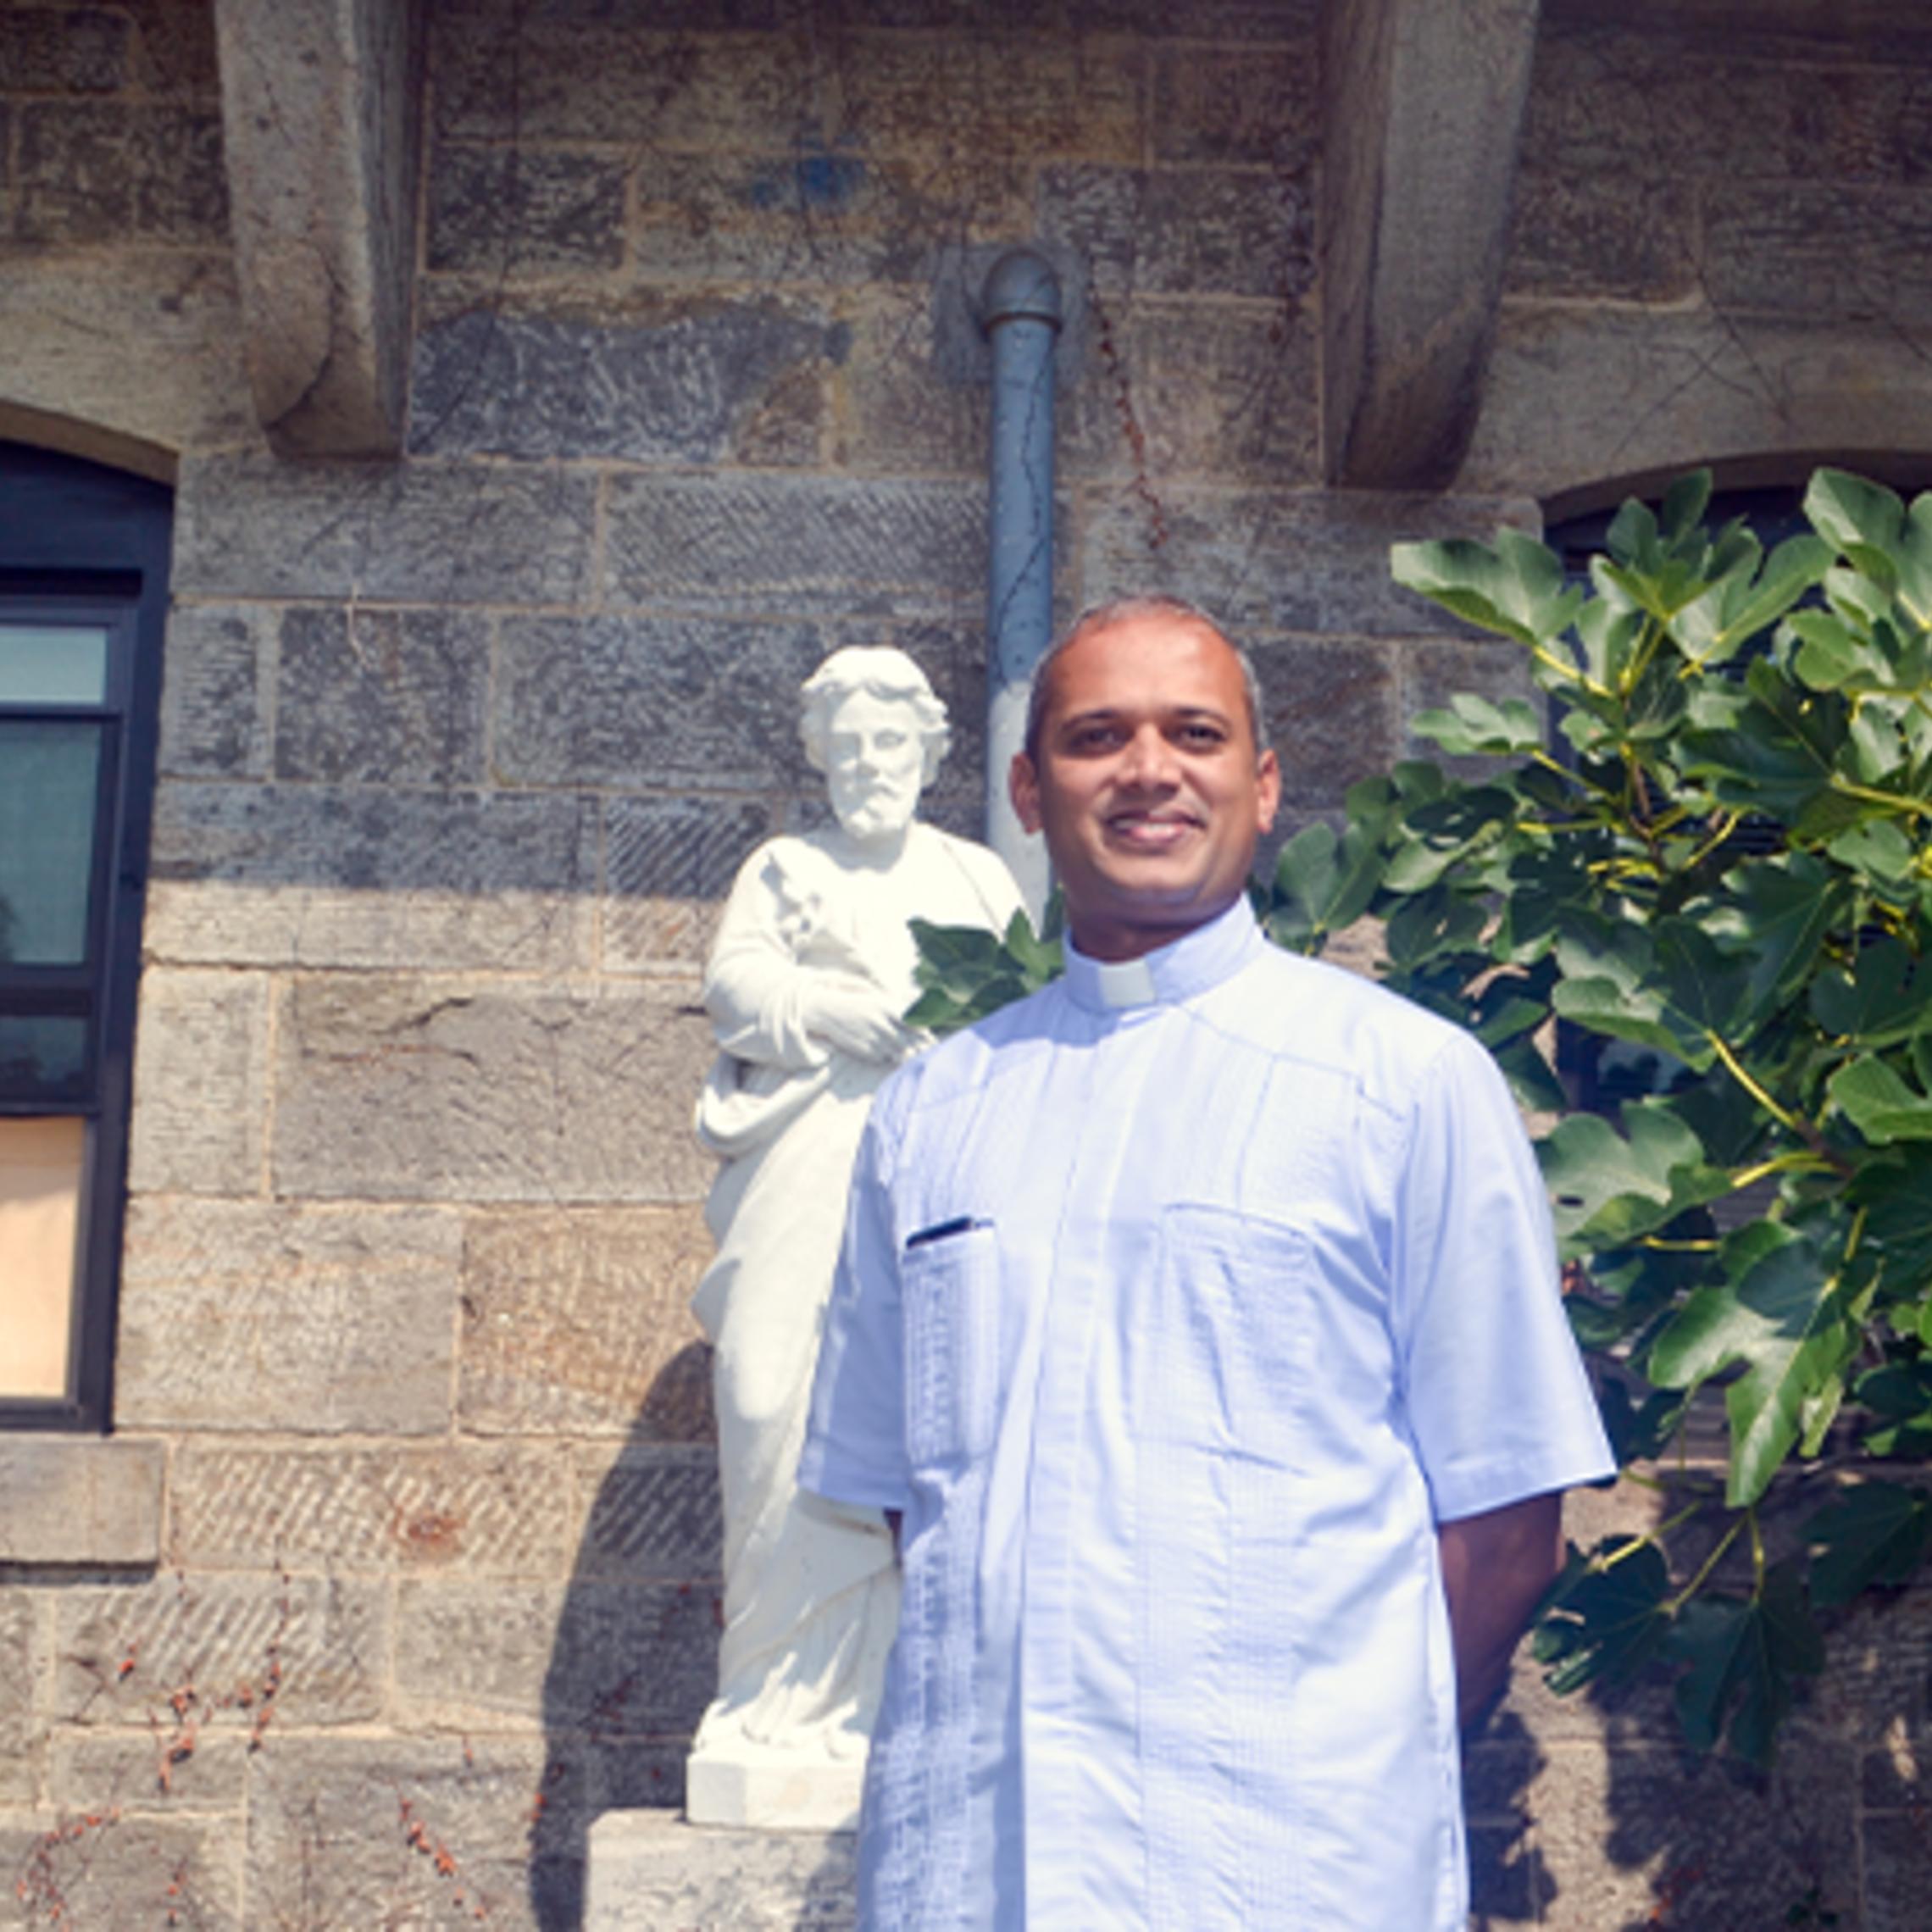 Welcome, Fr. Shiju!